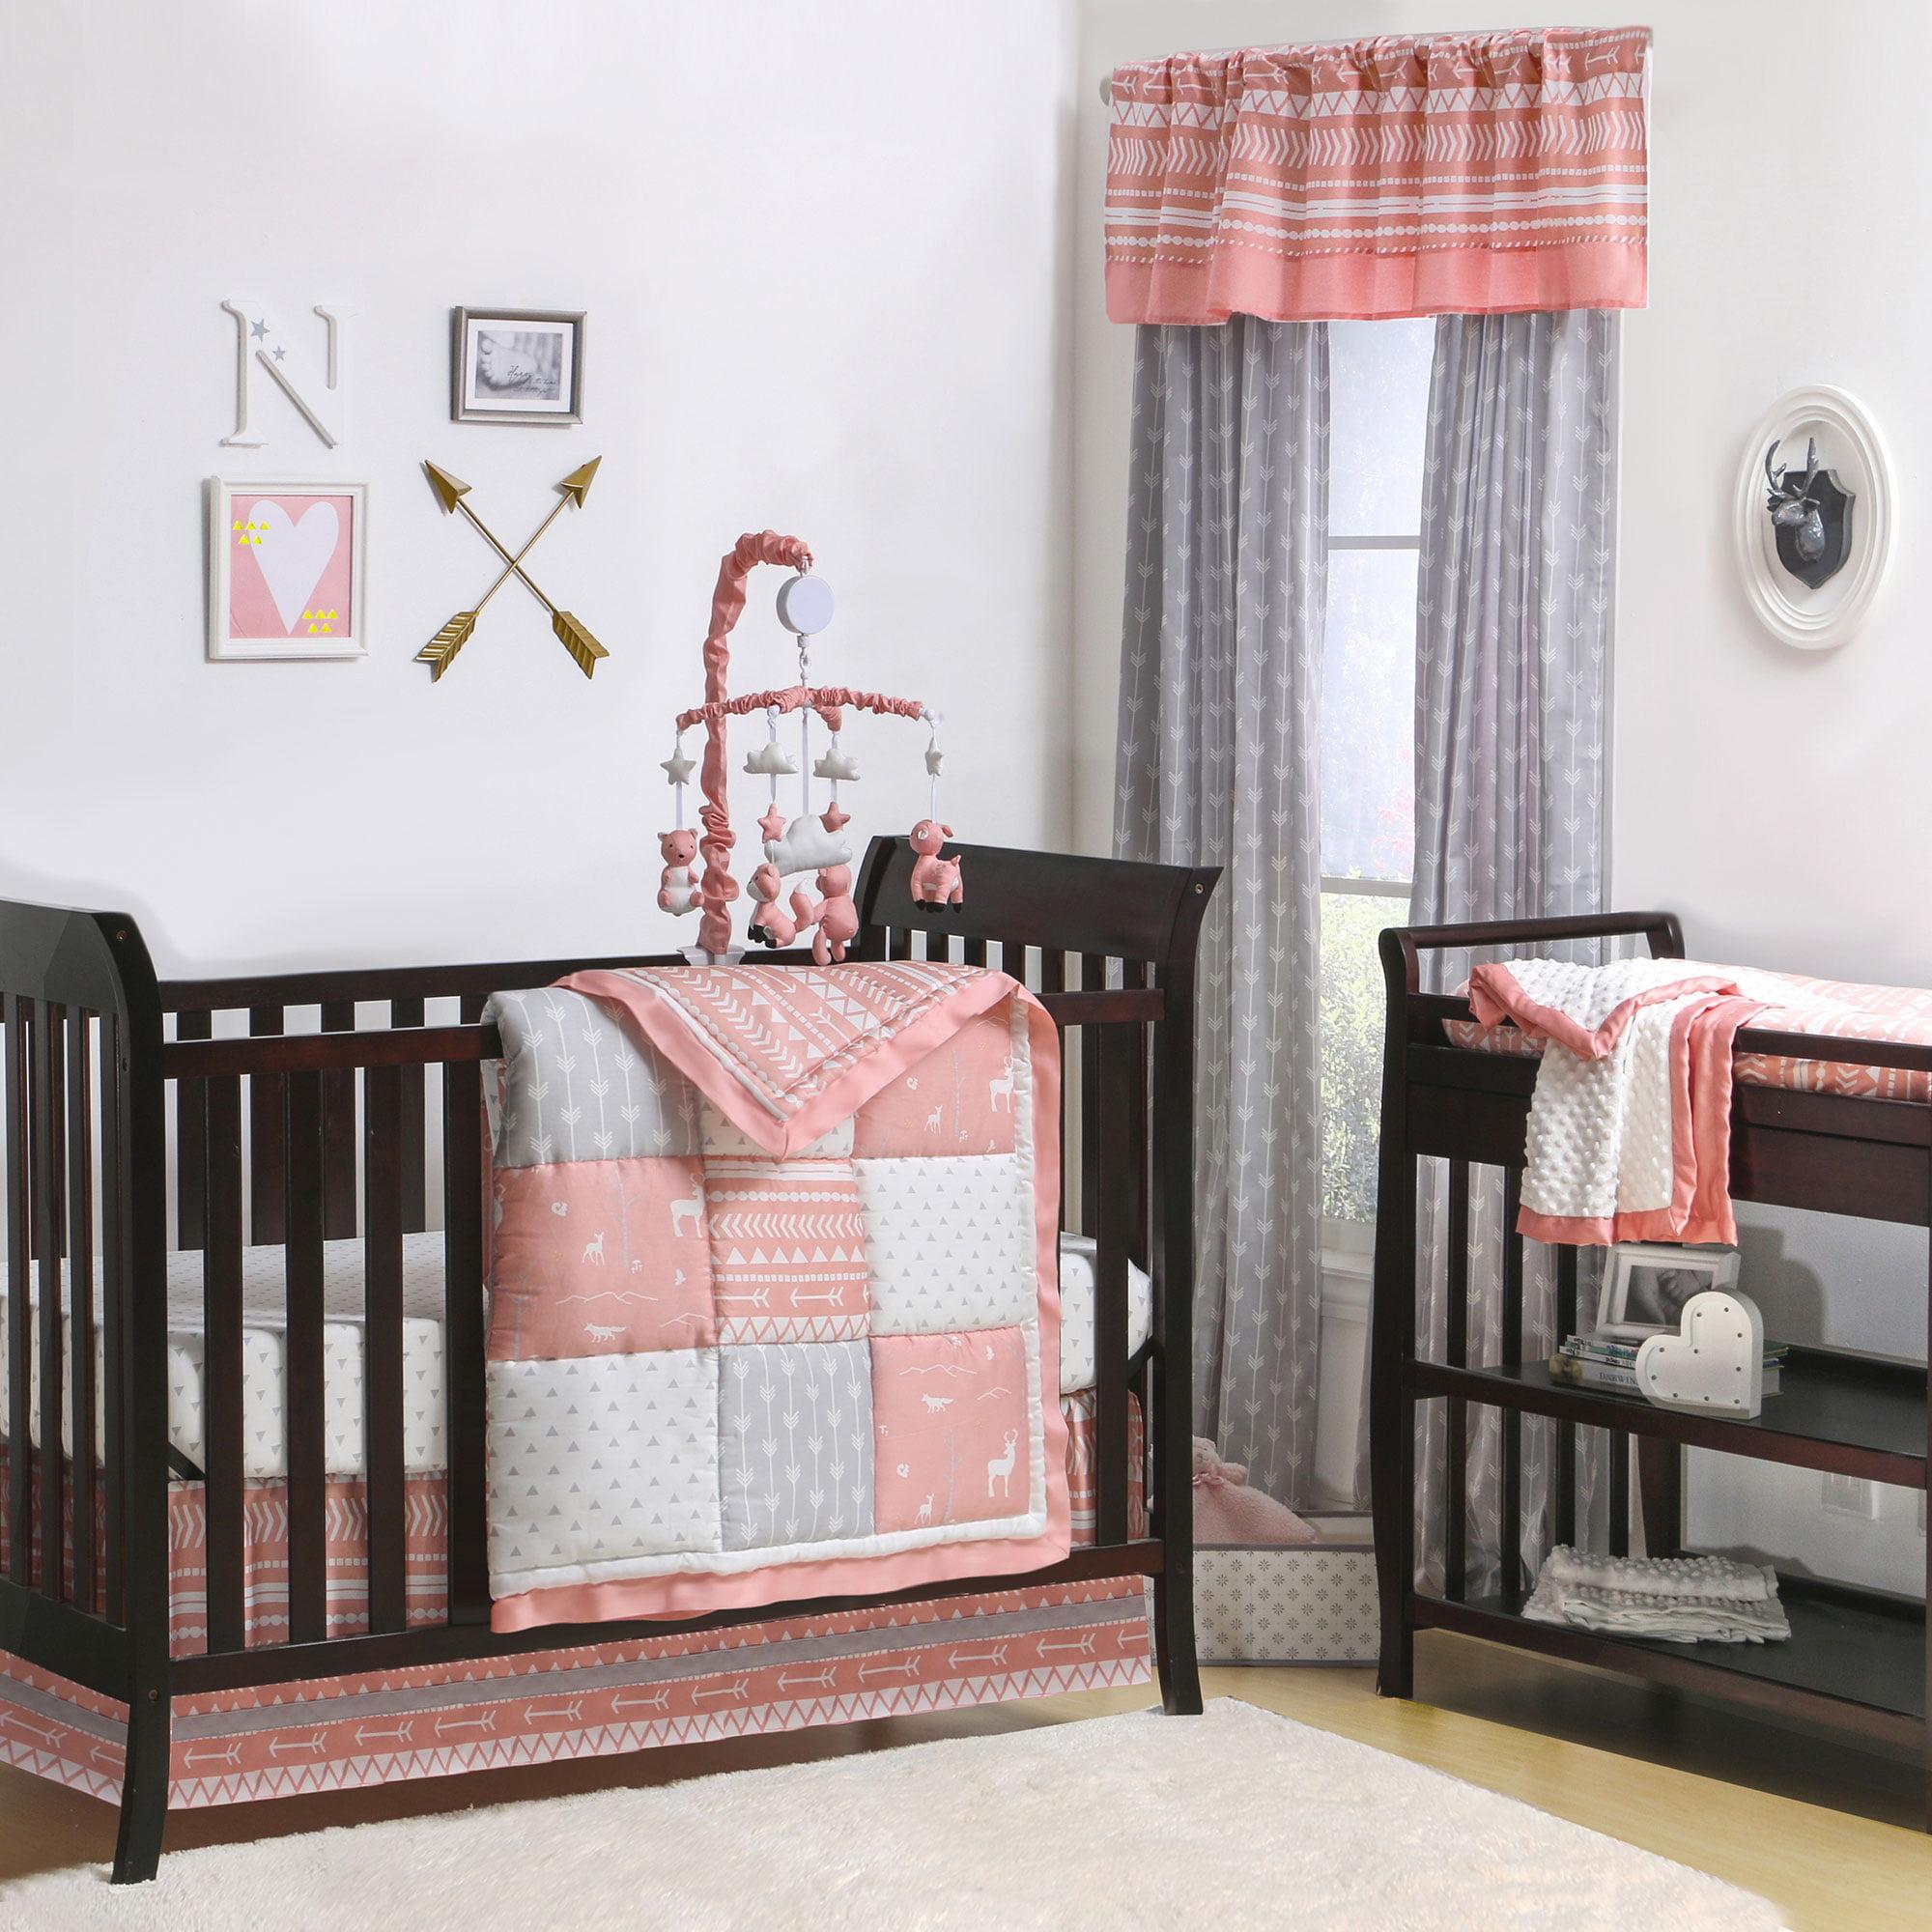 Crib Bedding Sets With Stars